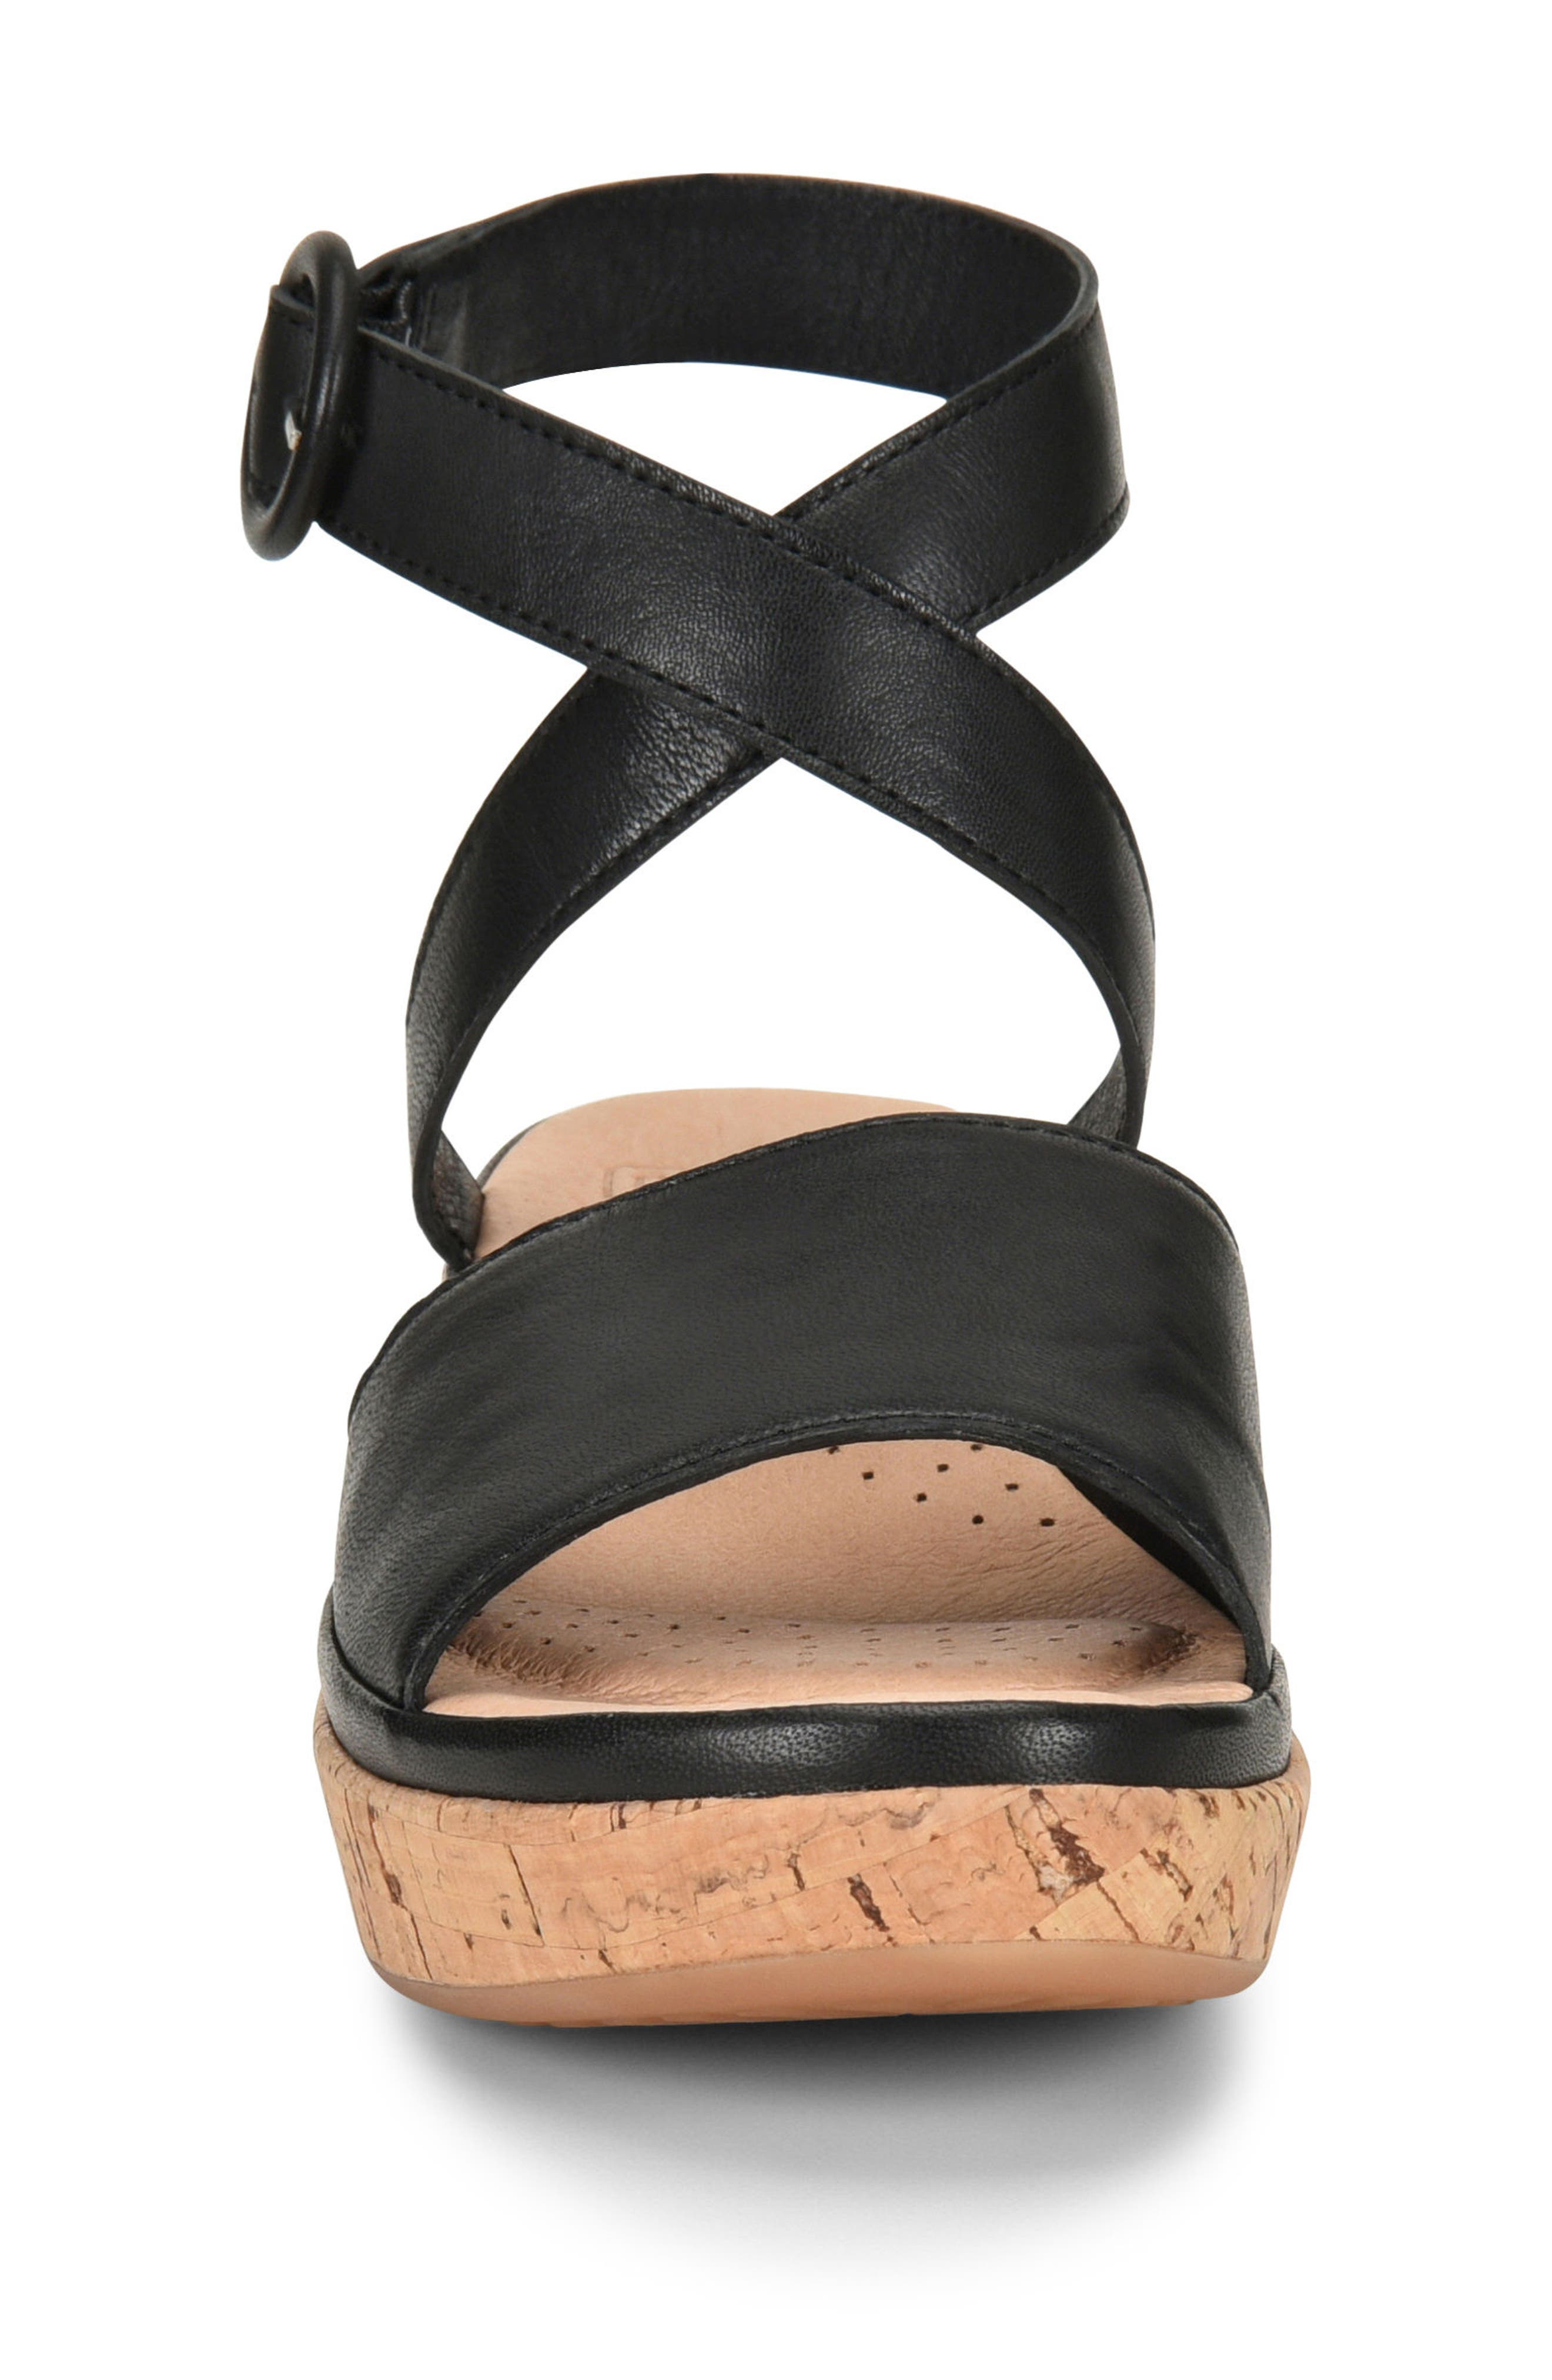 ONO, Dreamy Platform Wedge Sandal, Alternate thumbnail 4, color, BLACK LEATHER